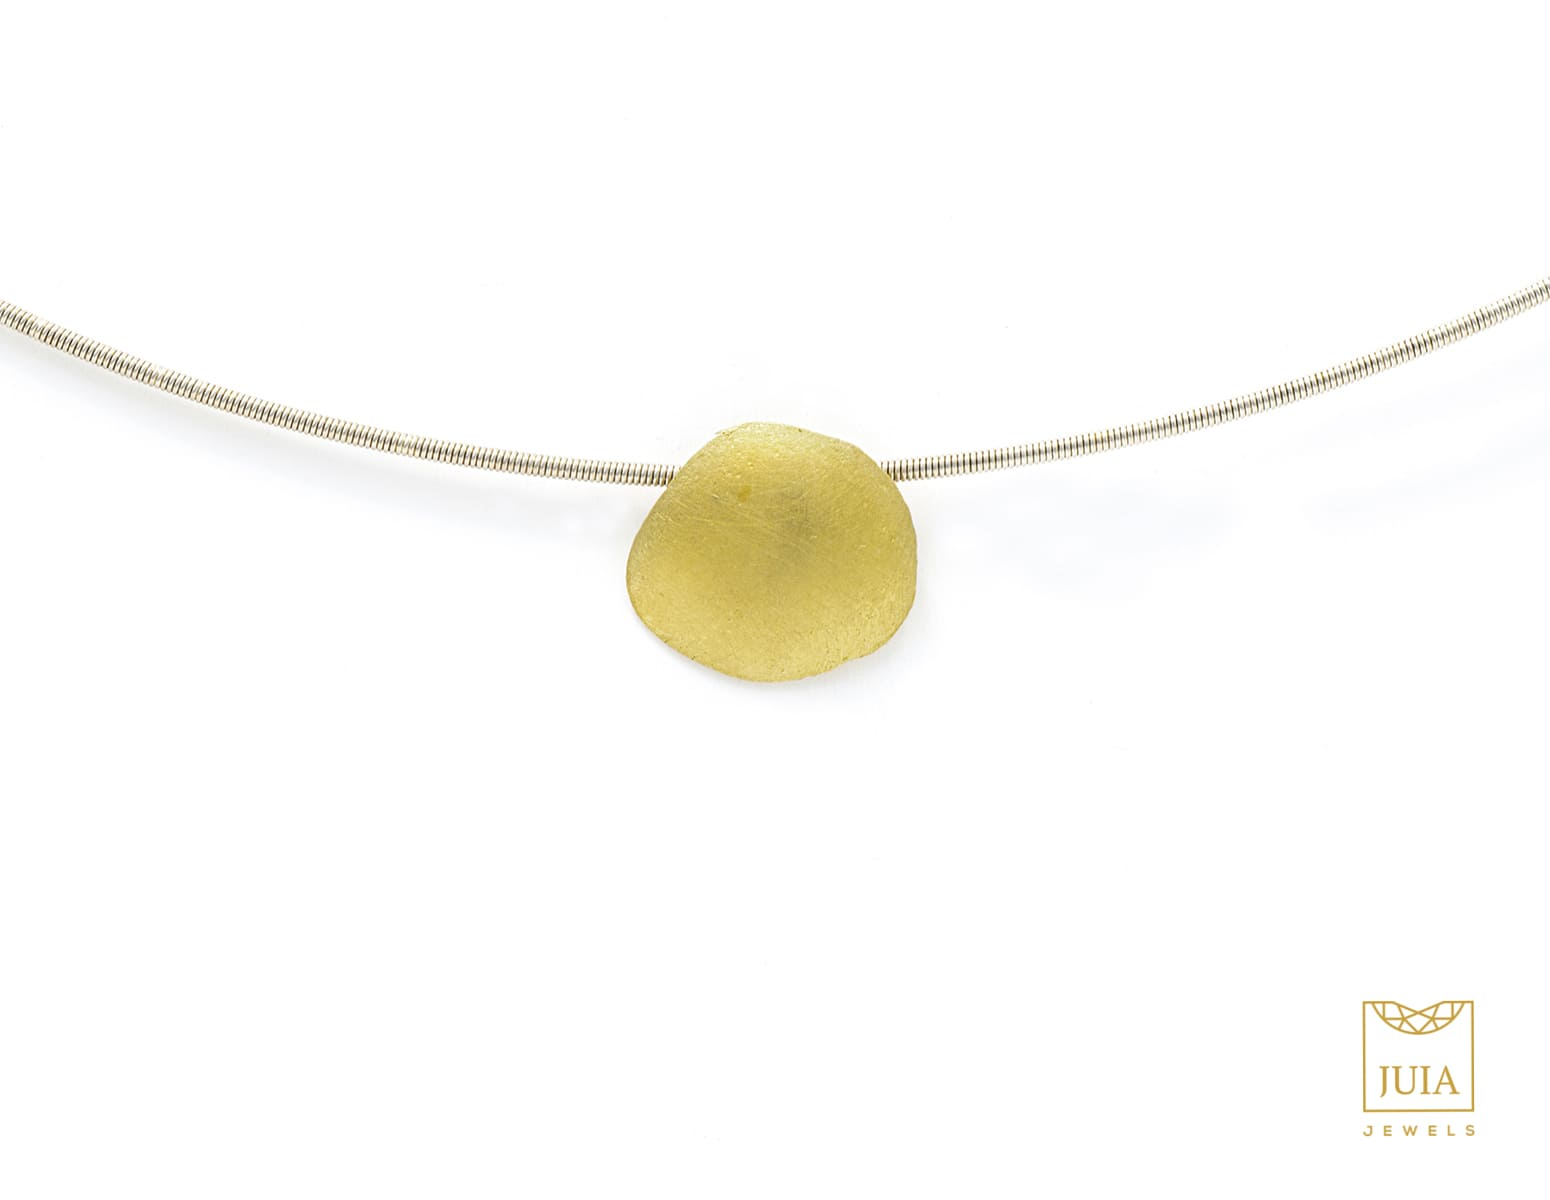 collar de oro para aniversario, joyas artesanales, joyas para regalar, juia jewels barcelona, joyasmarket